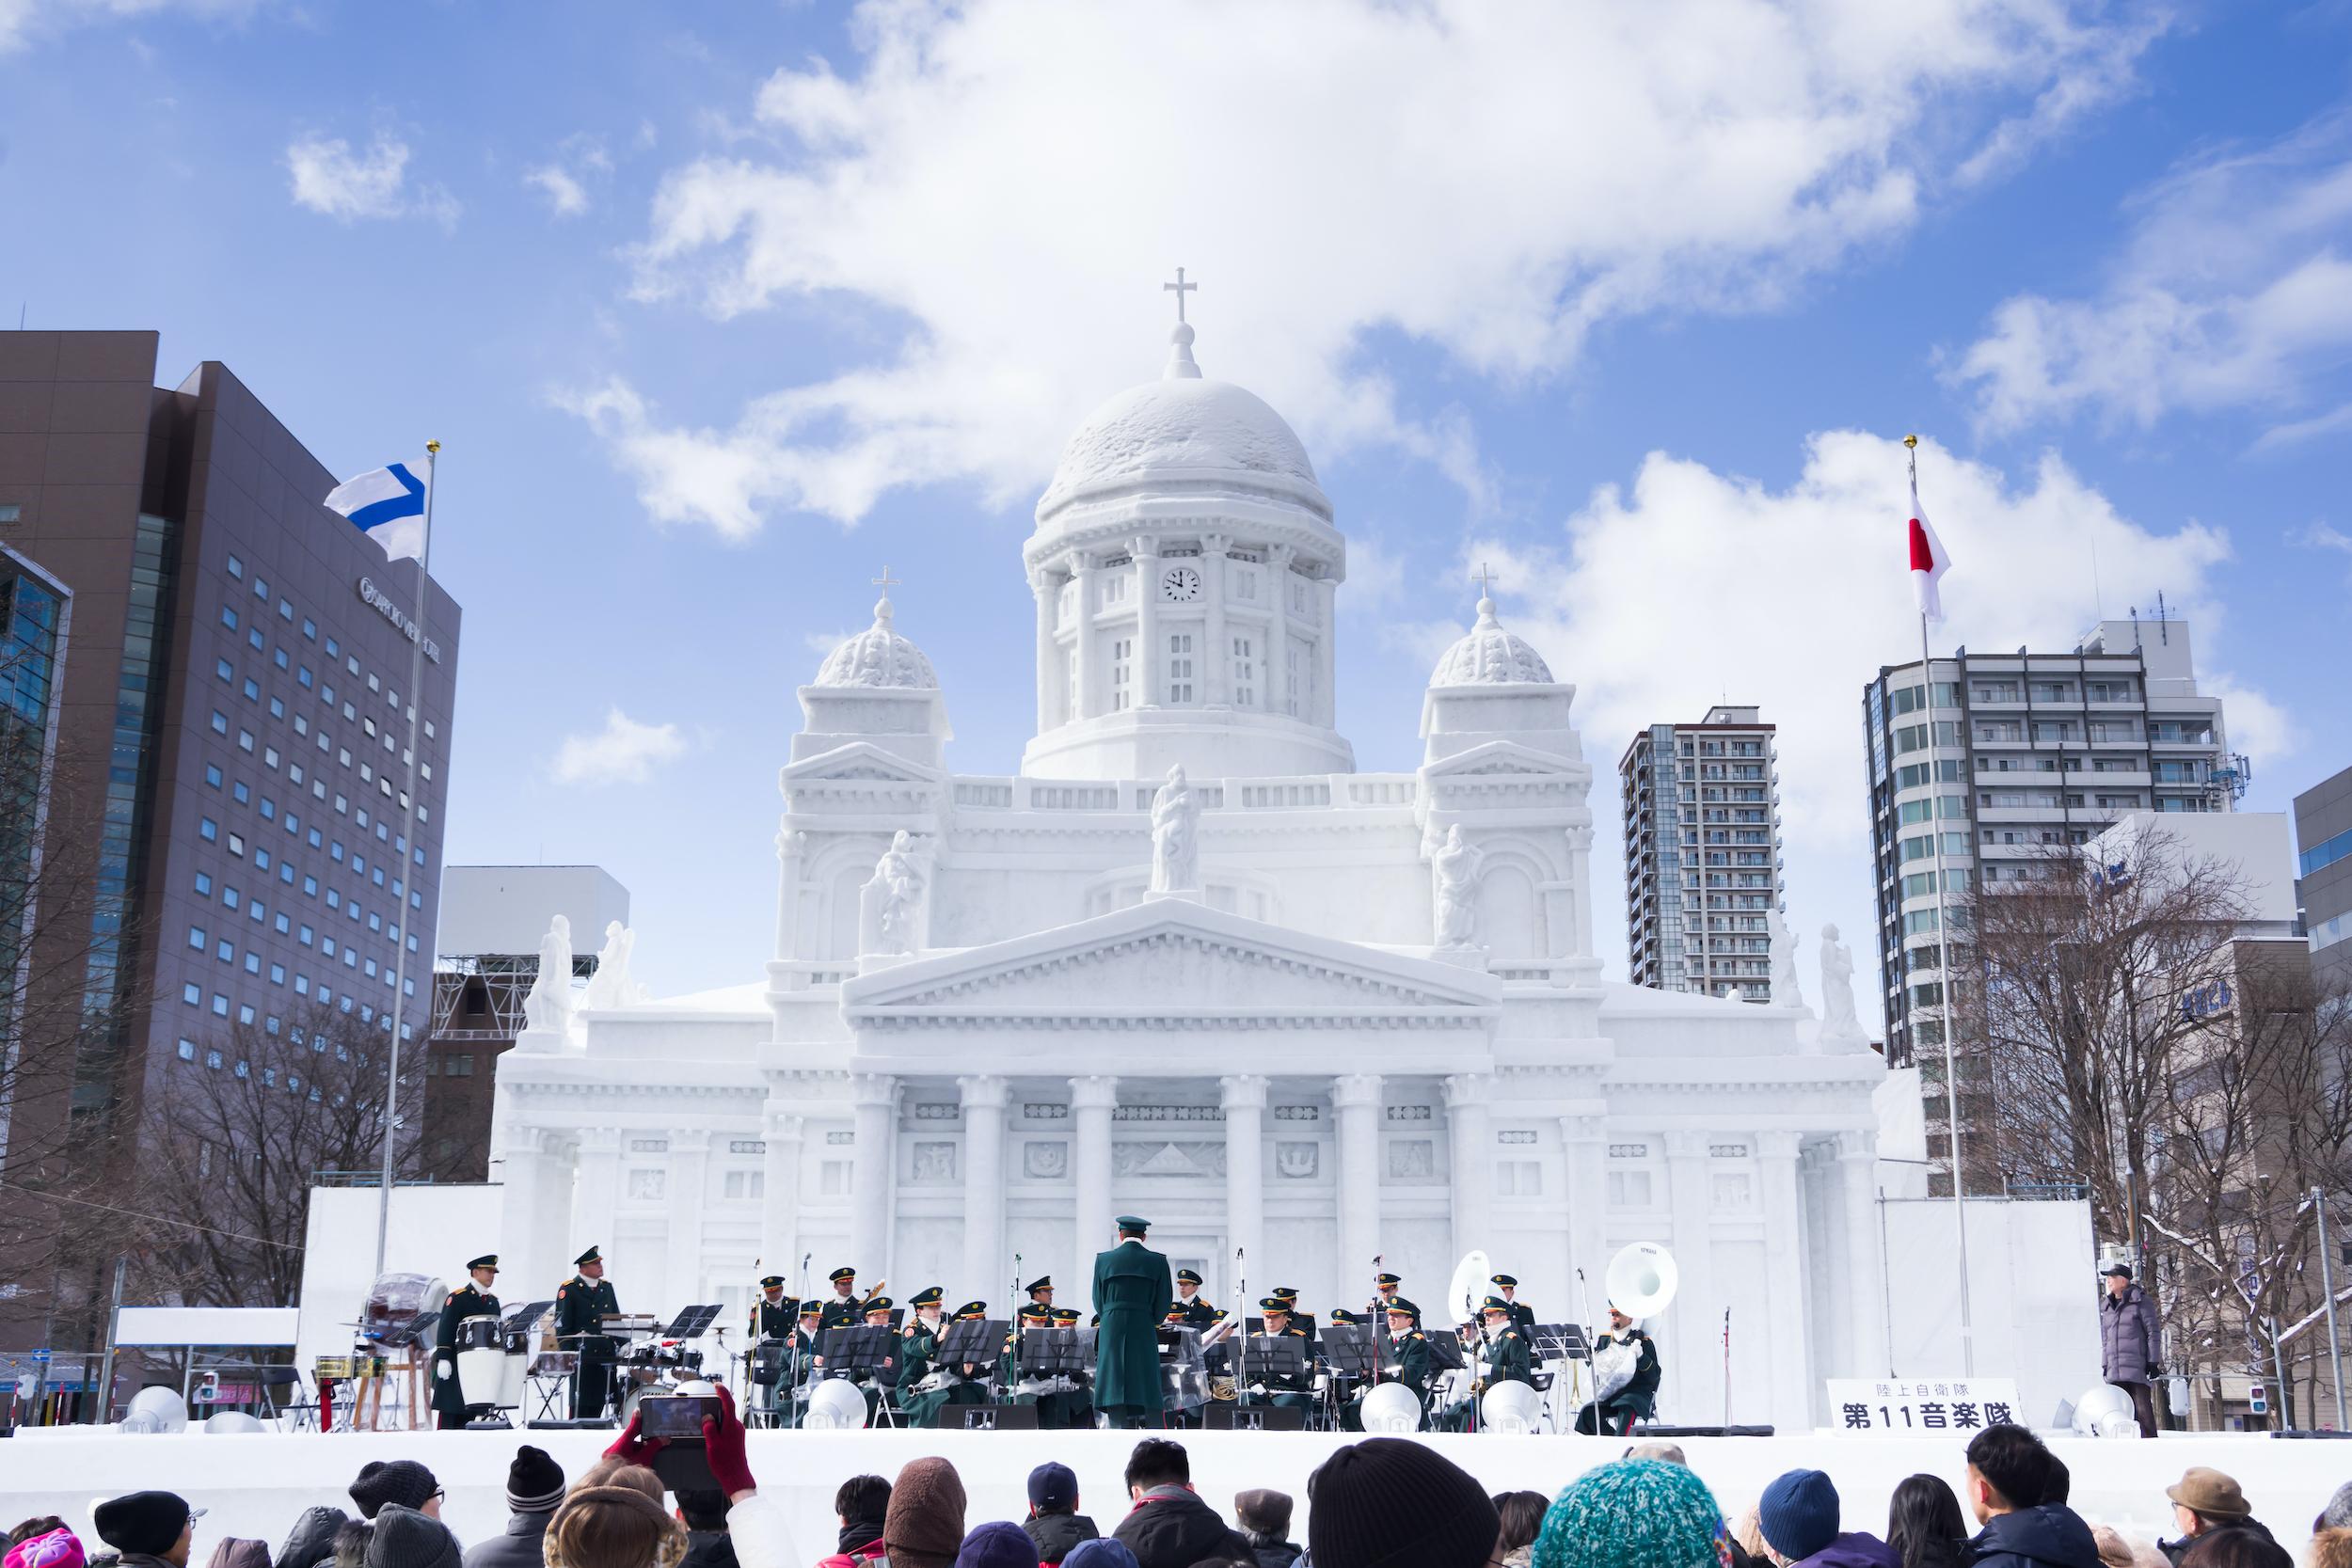 Festival neige Sapporo Japon 3